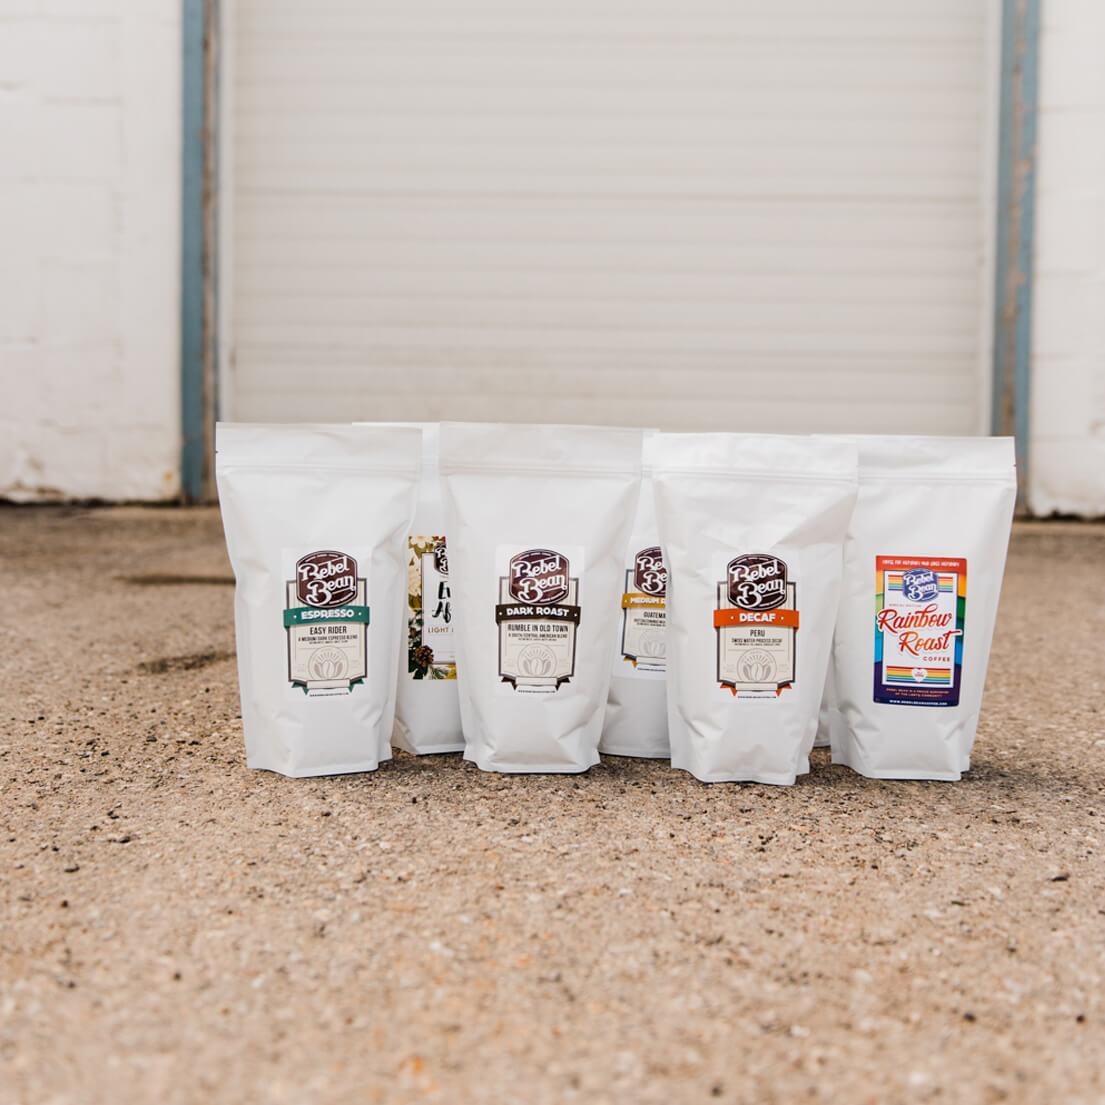 okotoks coffee subscription - 6 months